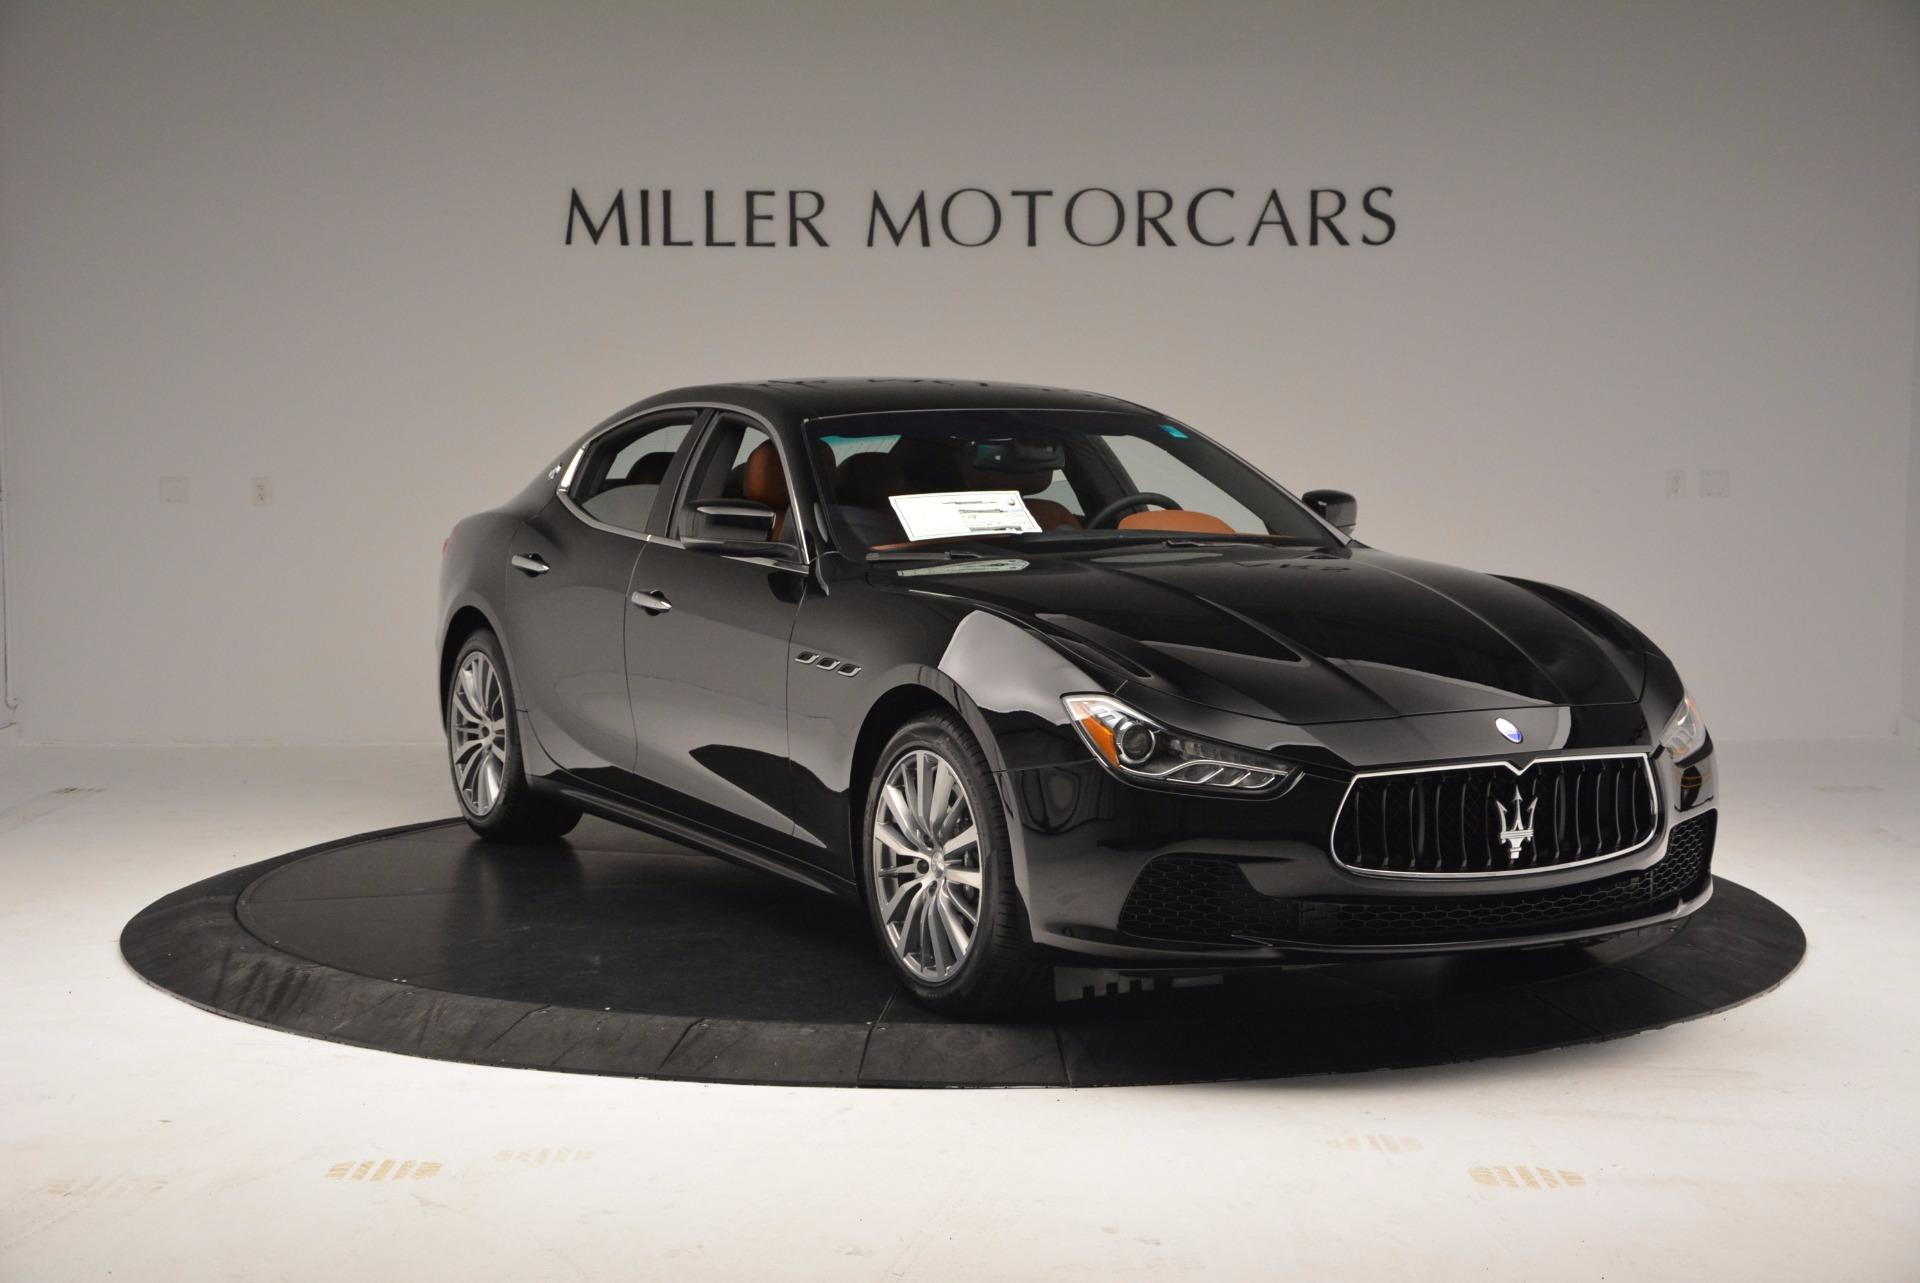 Used 2017 Maserati Ghibli S Q4 EX-Loaner For Sale In Greenwich, CT 776_p11